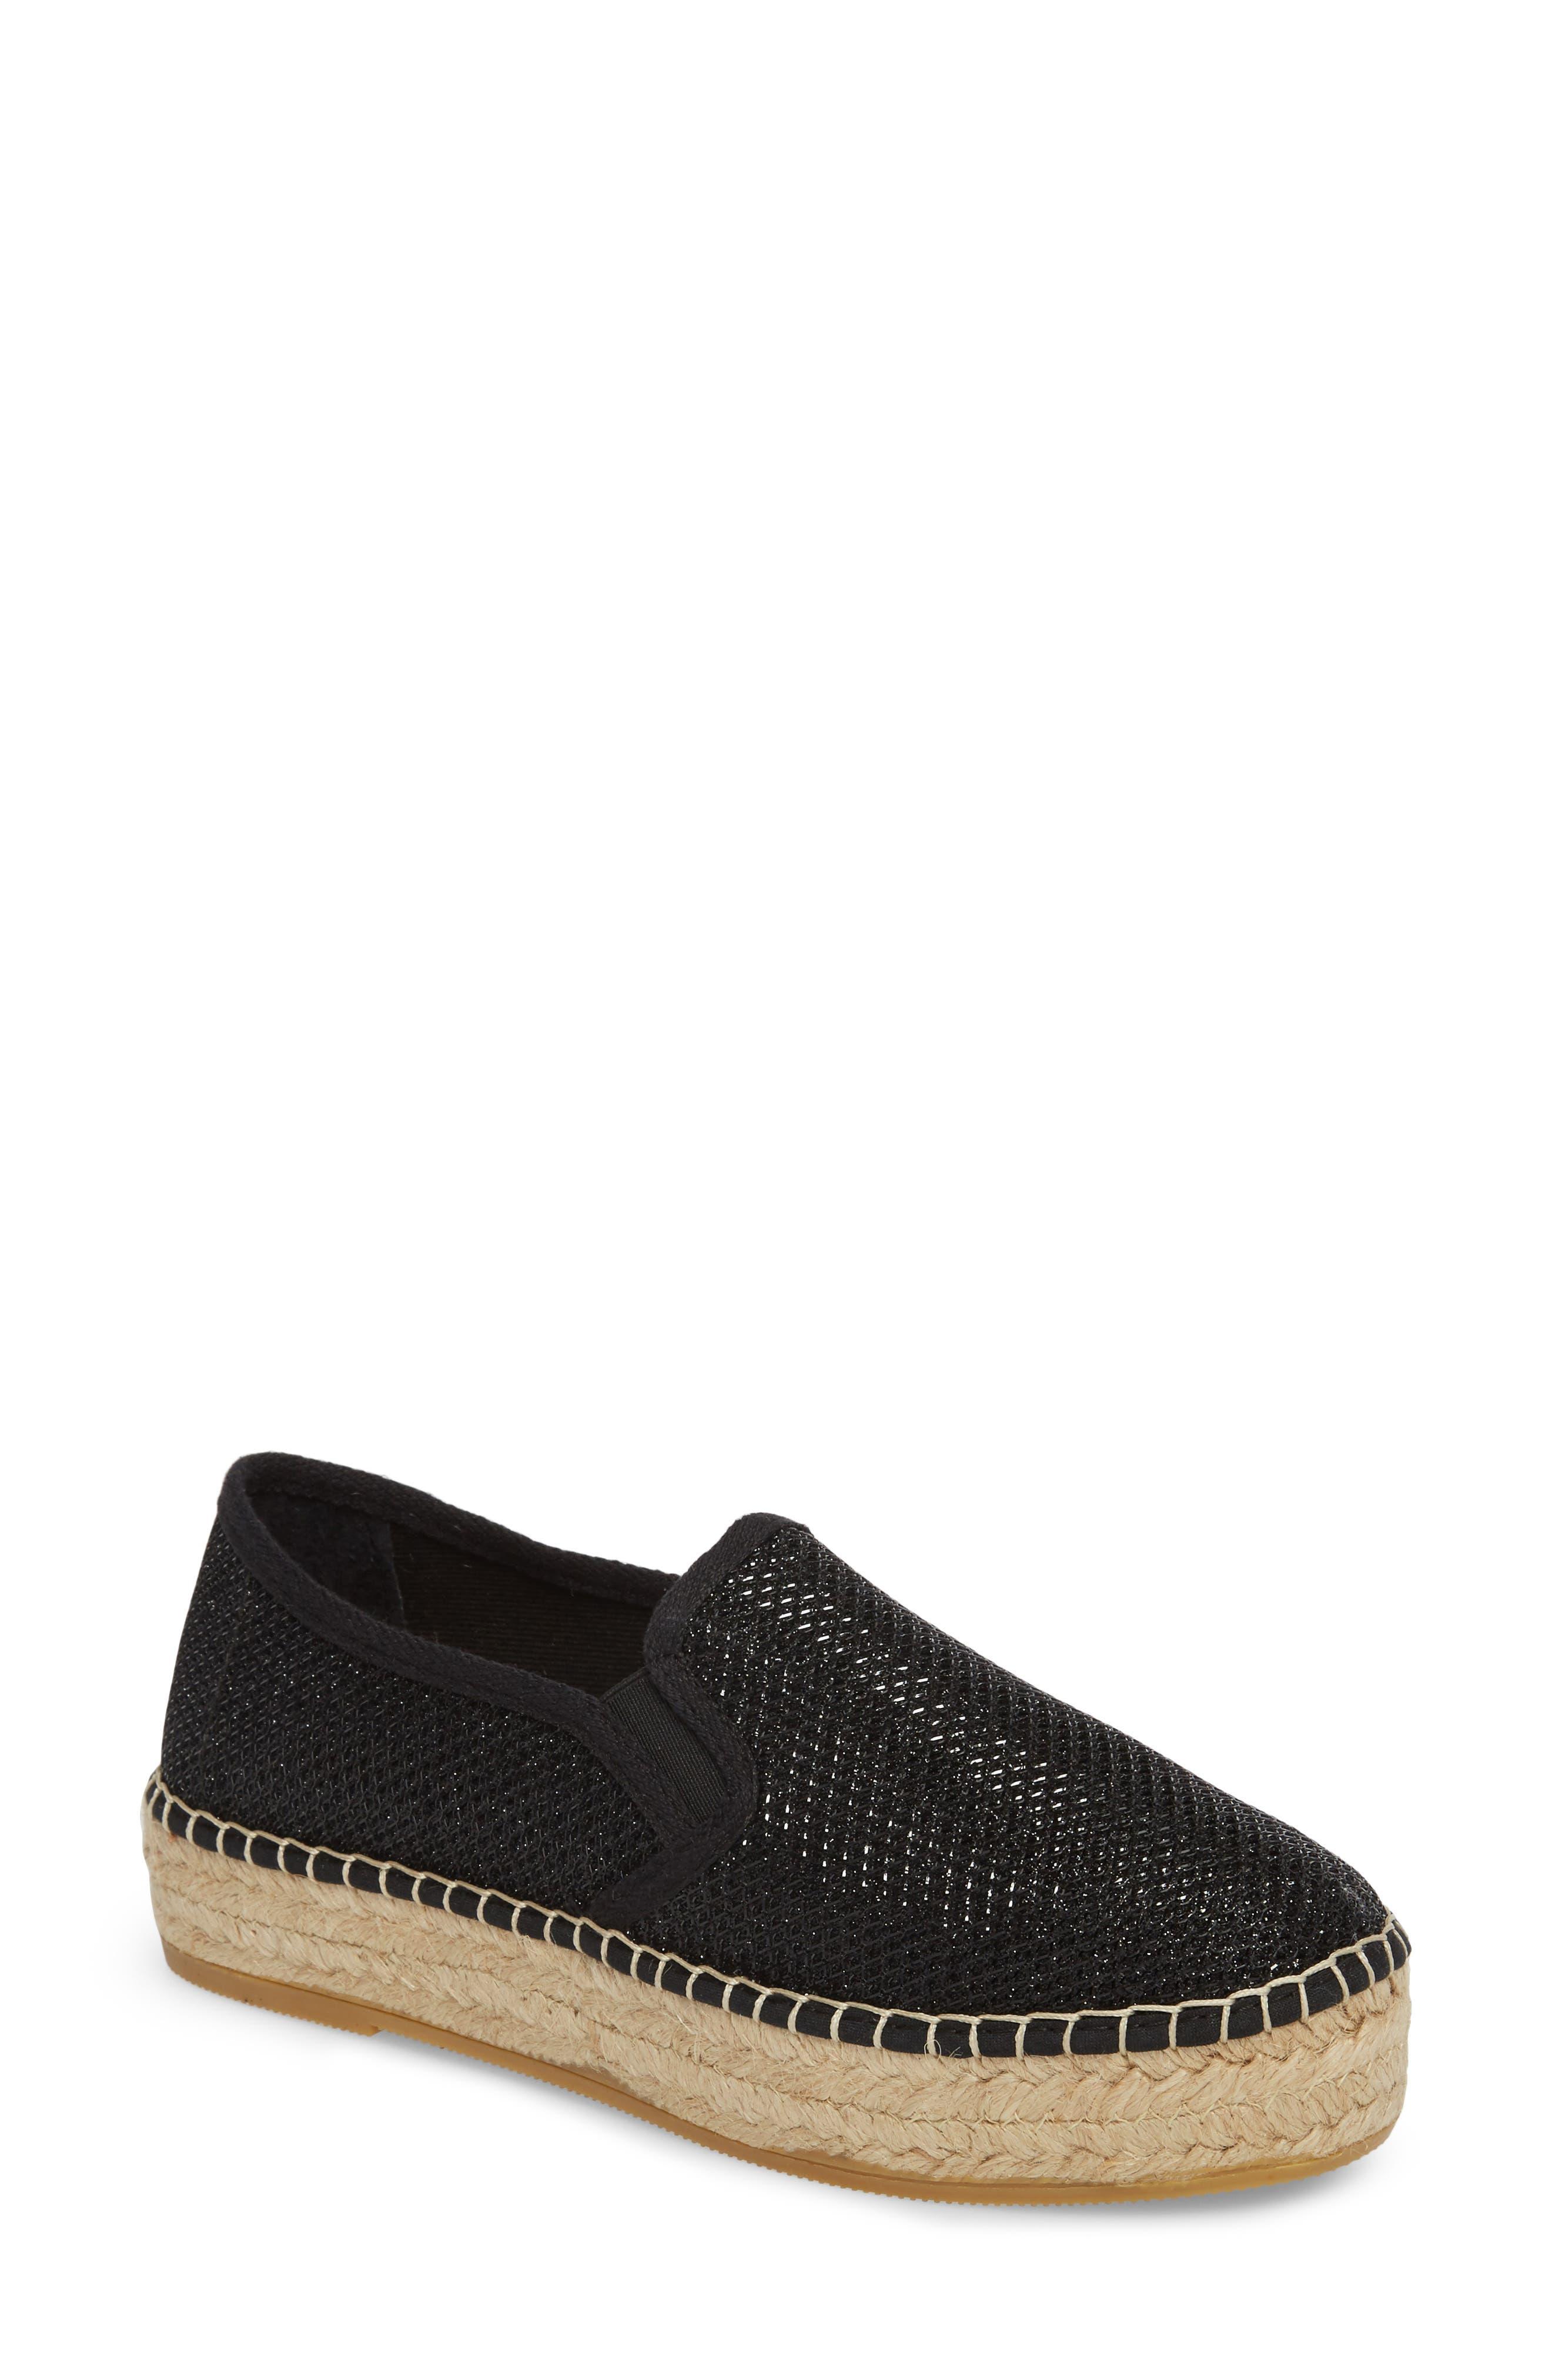 Fonda Platform Espadrille Sneaker,                             Main thumbnail 1, color,                             BLACK FABRIC